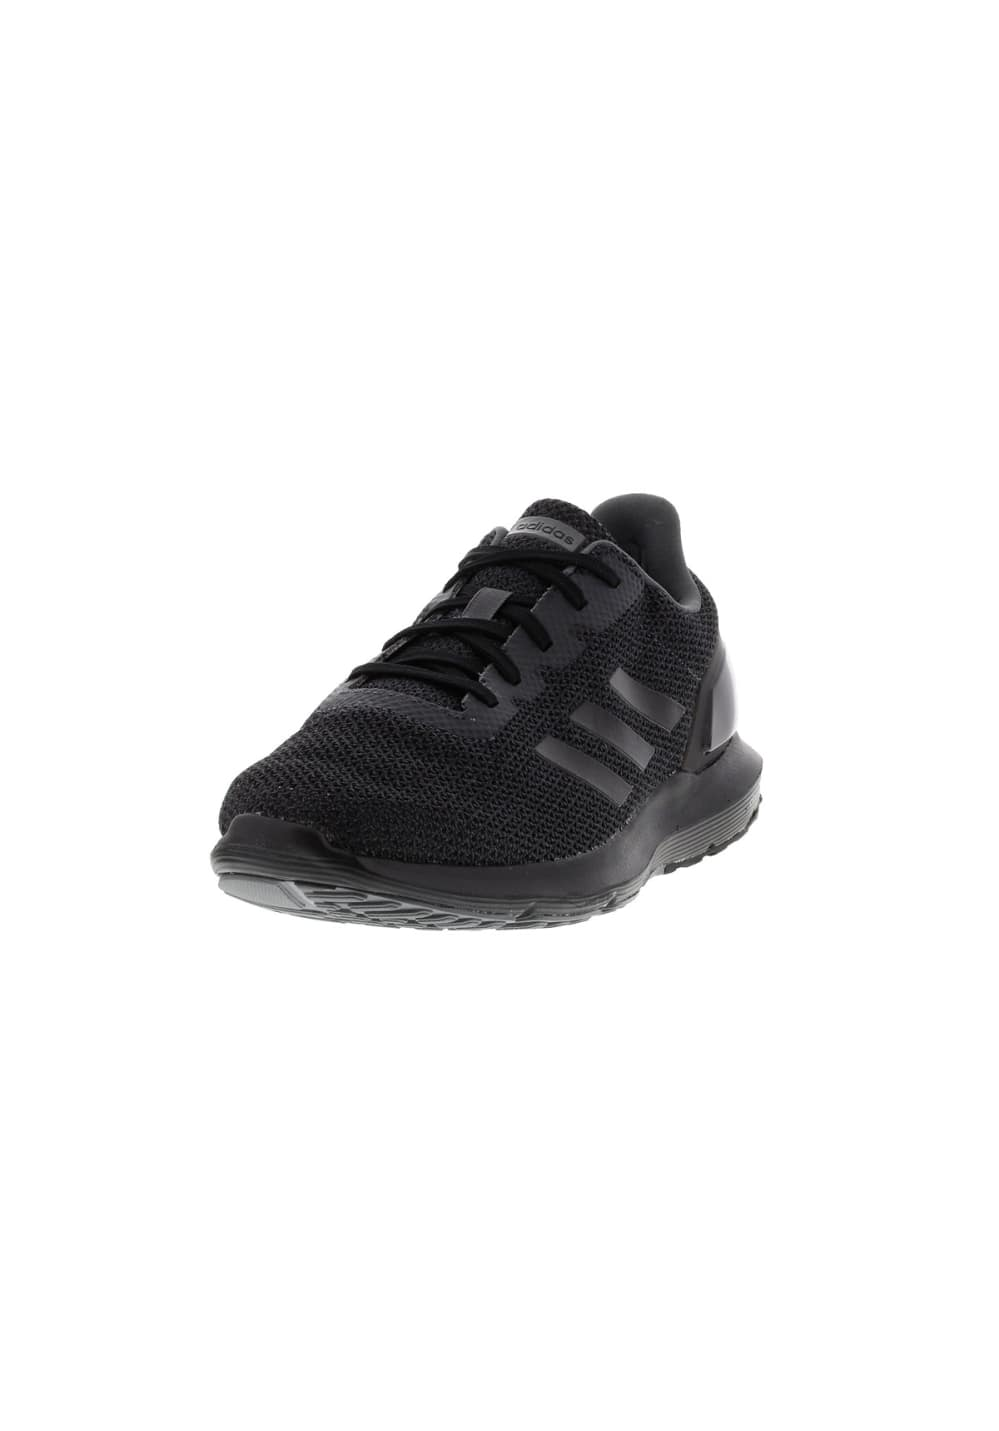 2366c570032c1 ... adidas Cosmic 2 - Zapatillas de running para Hombre - Negro. Volver. 1   2  3  4  5. Previous